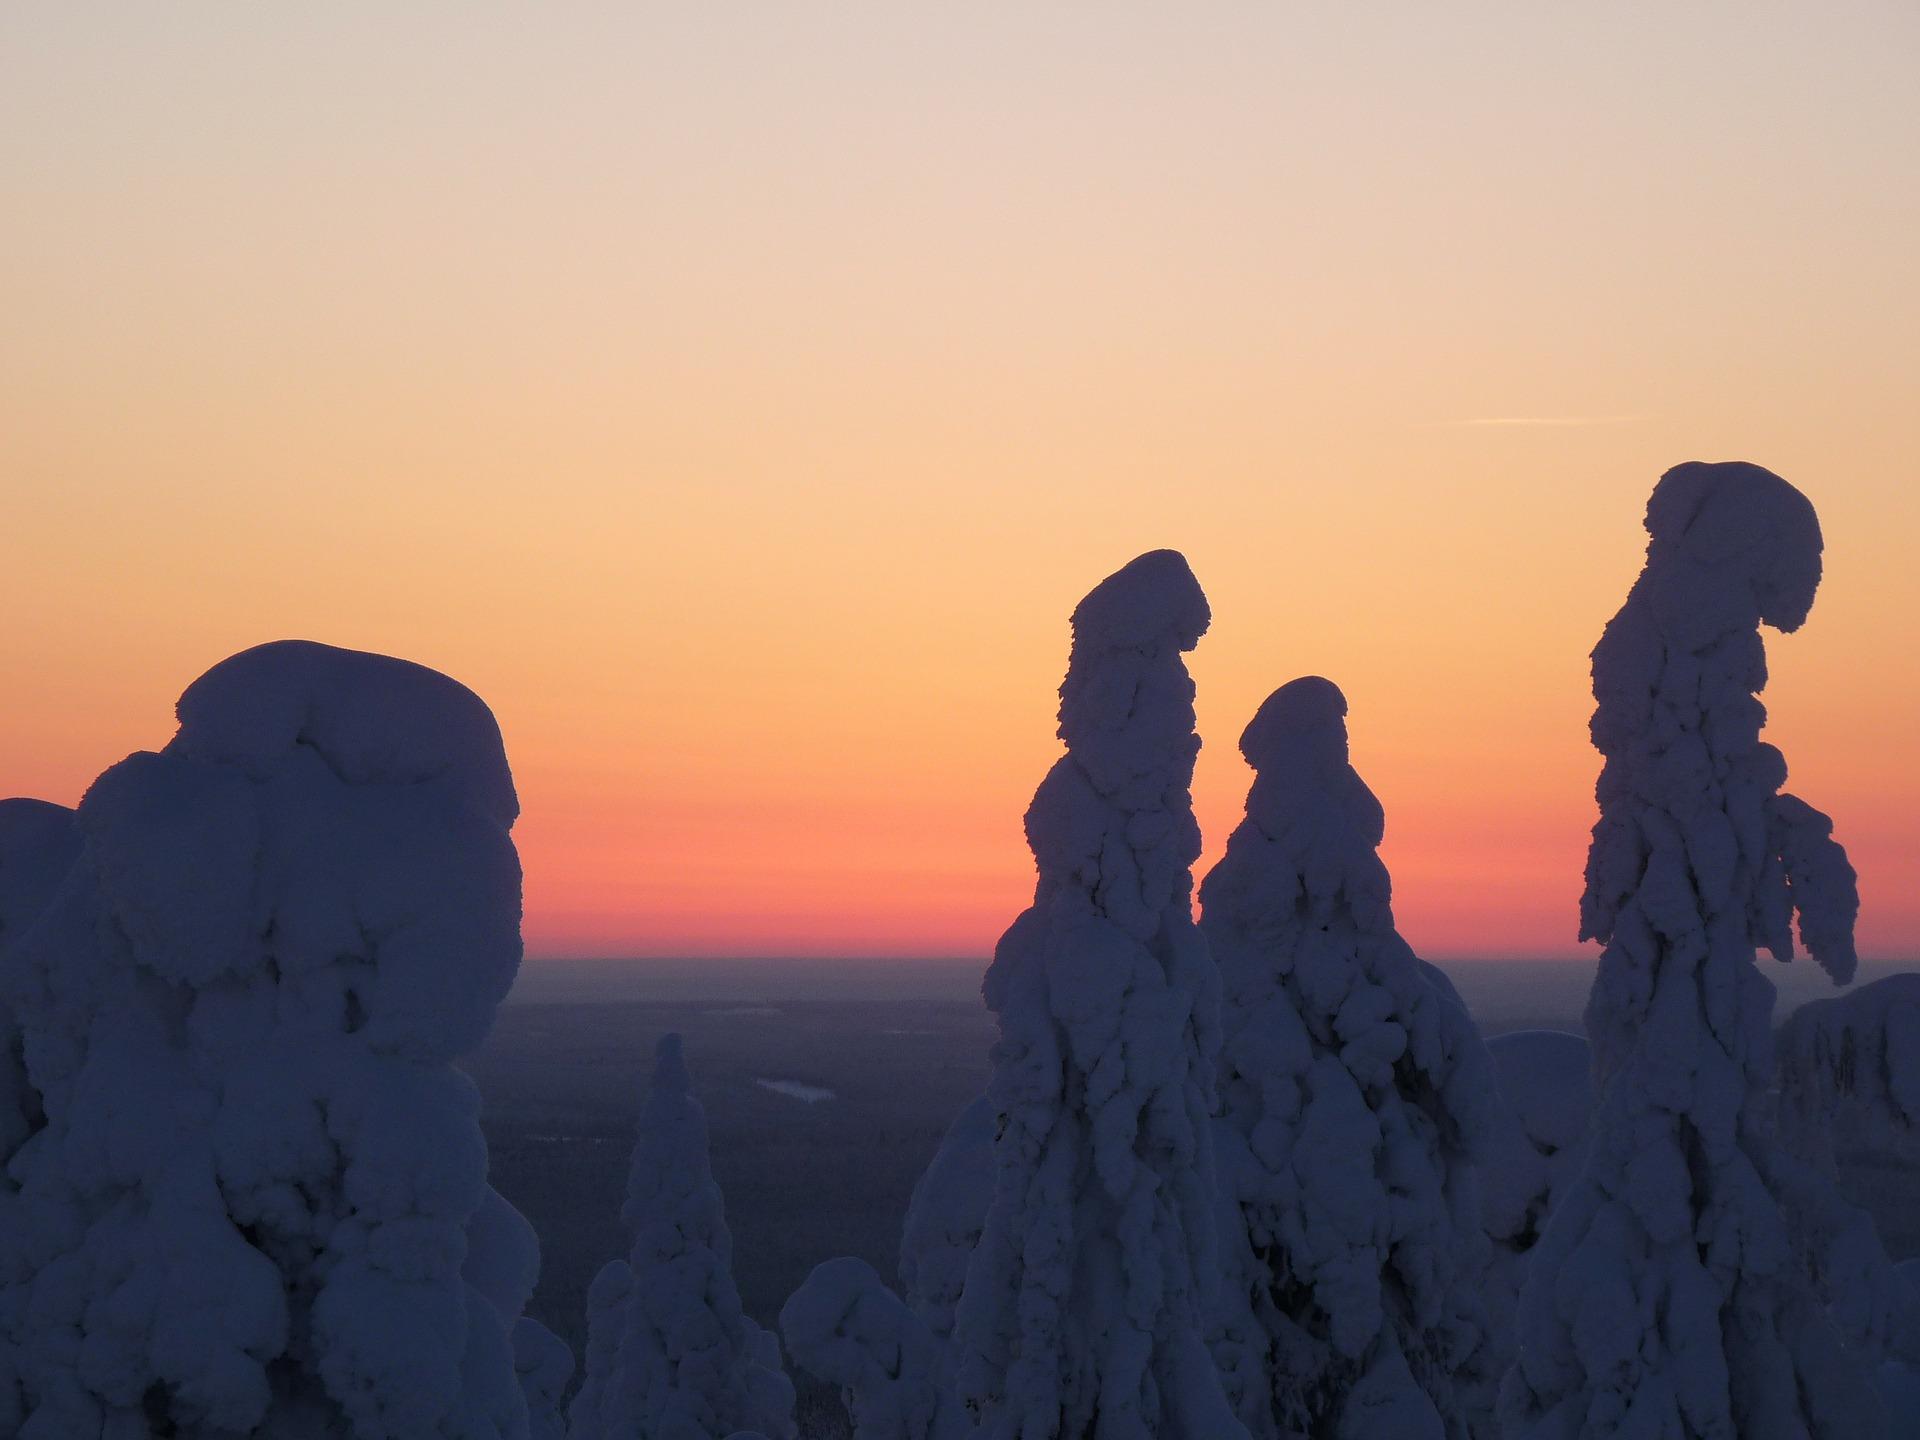 finland-209481_1920-1